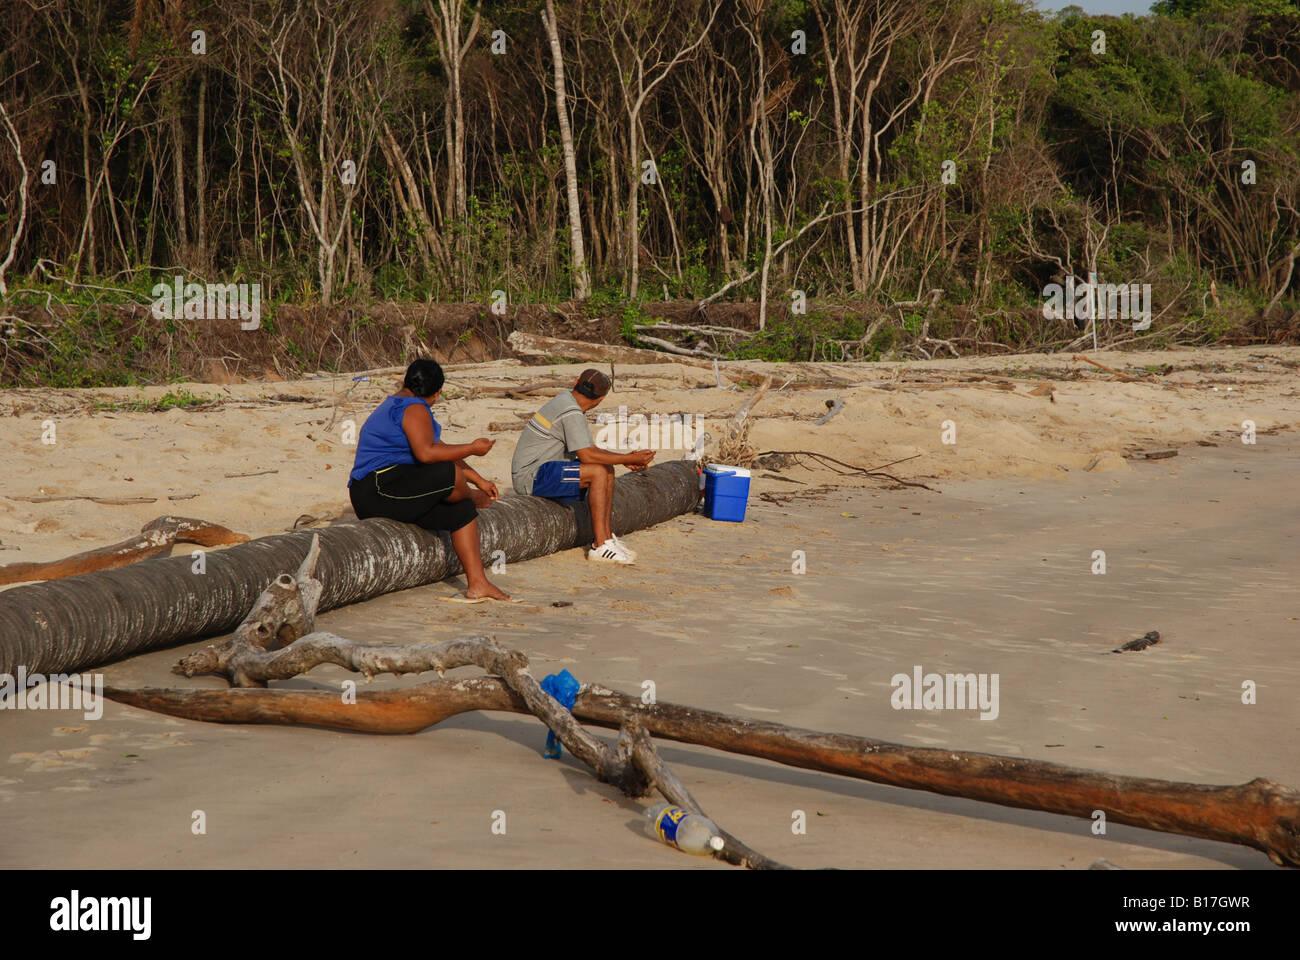 married couple amerindian fishing with fishing line - Stock Image